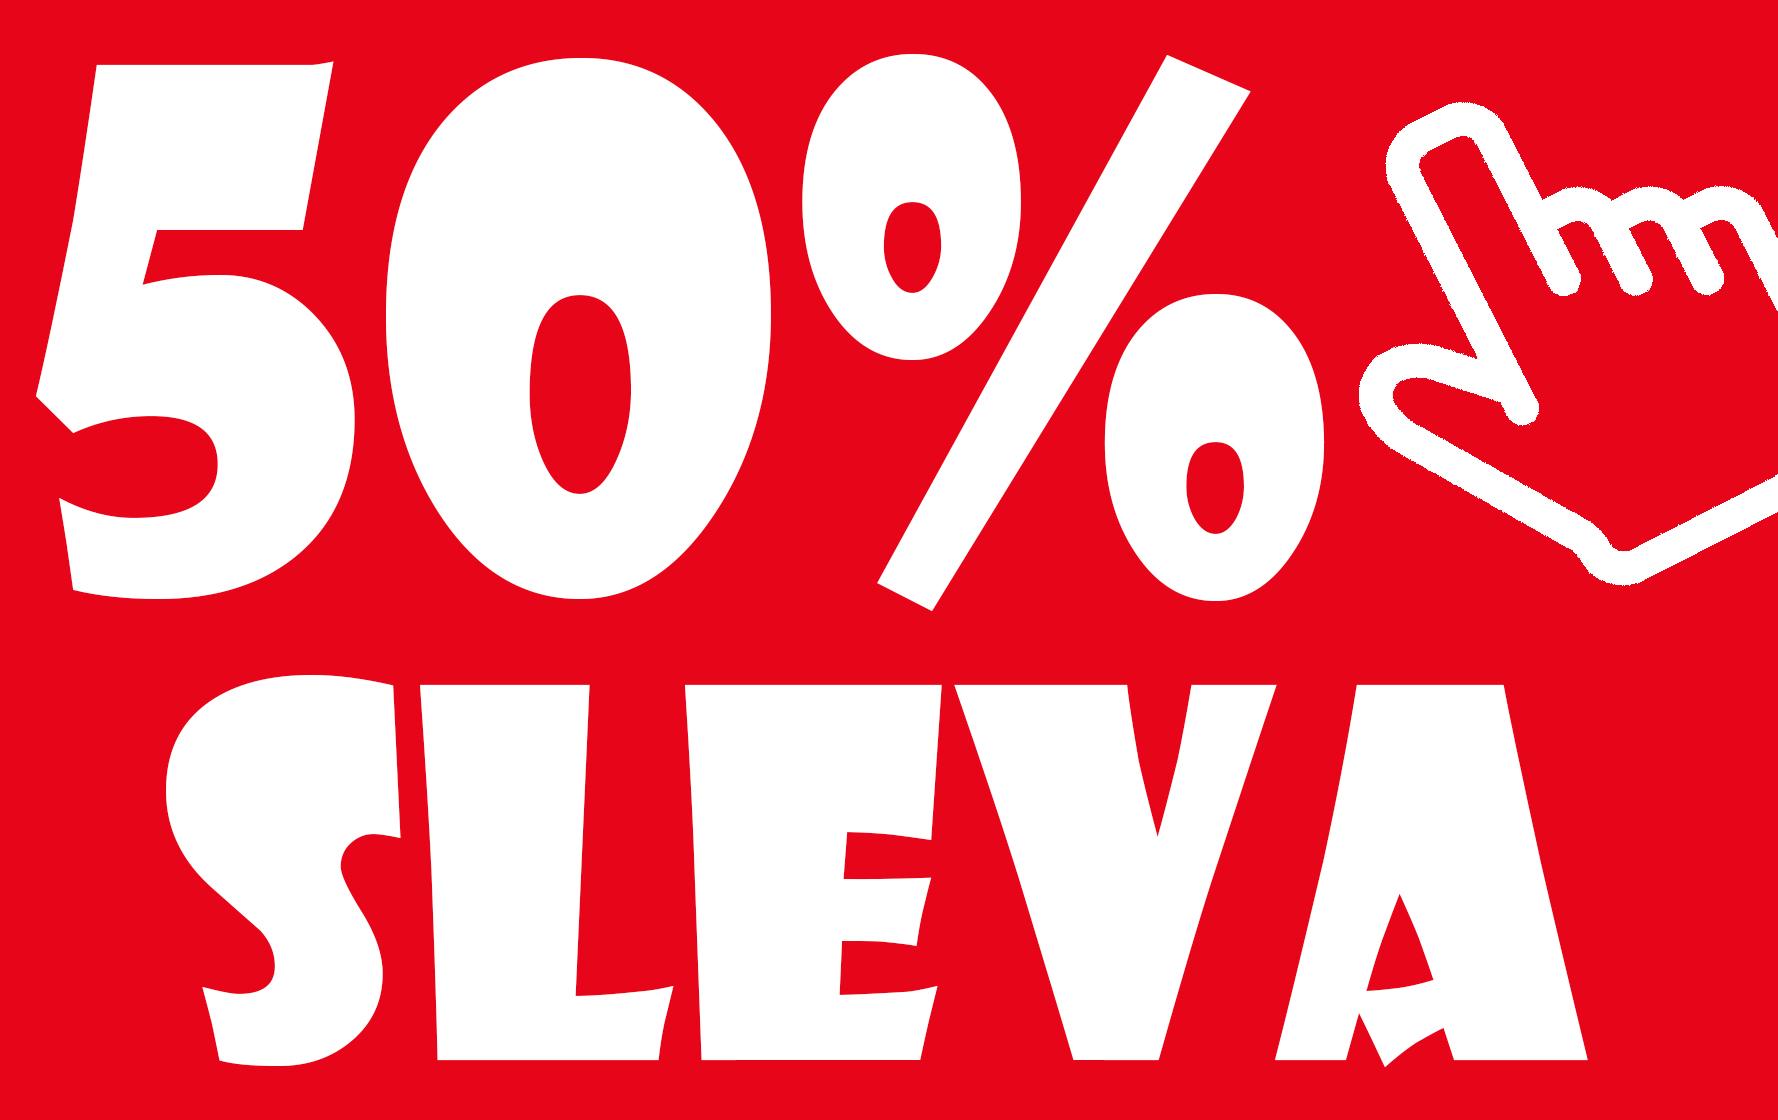 50% SLEVA